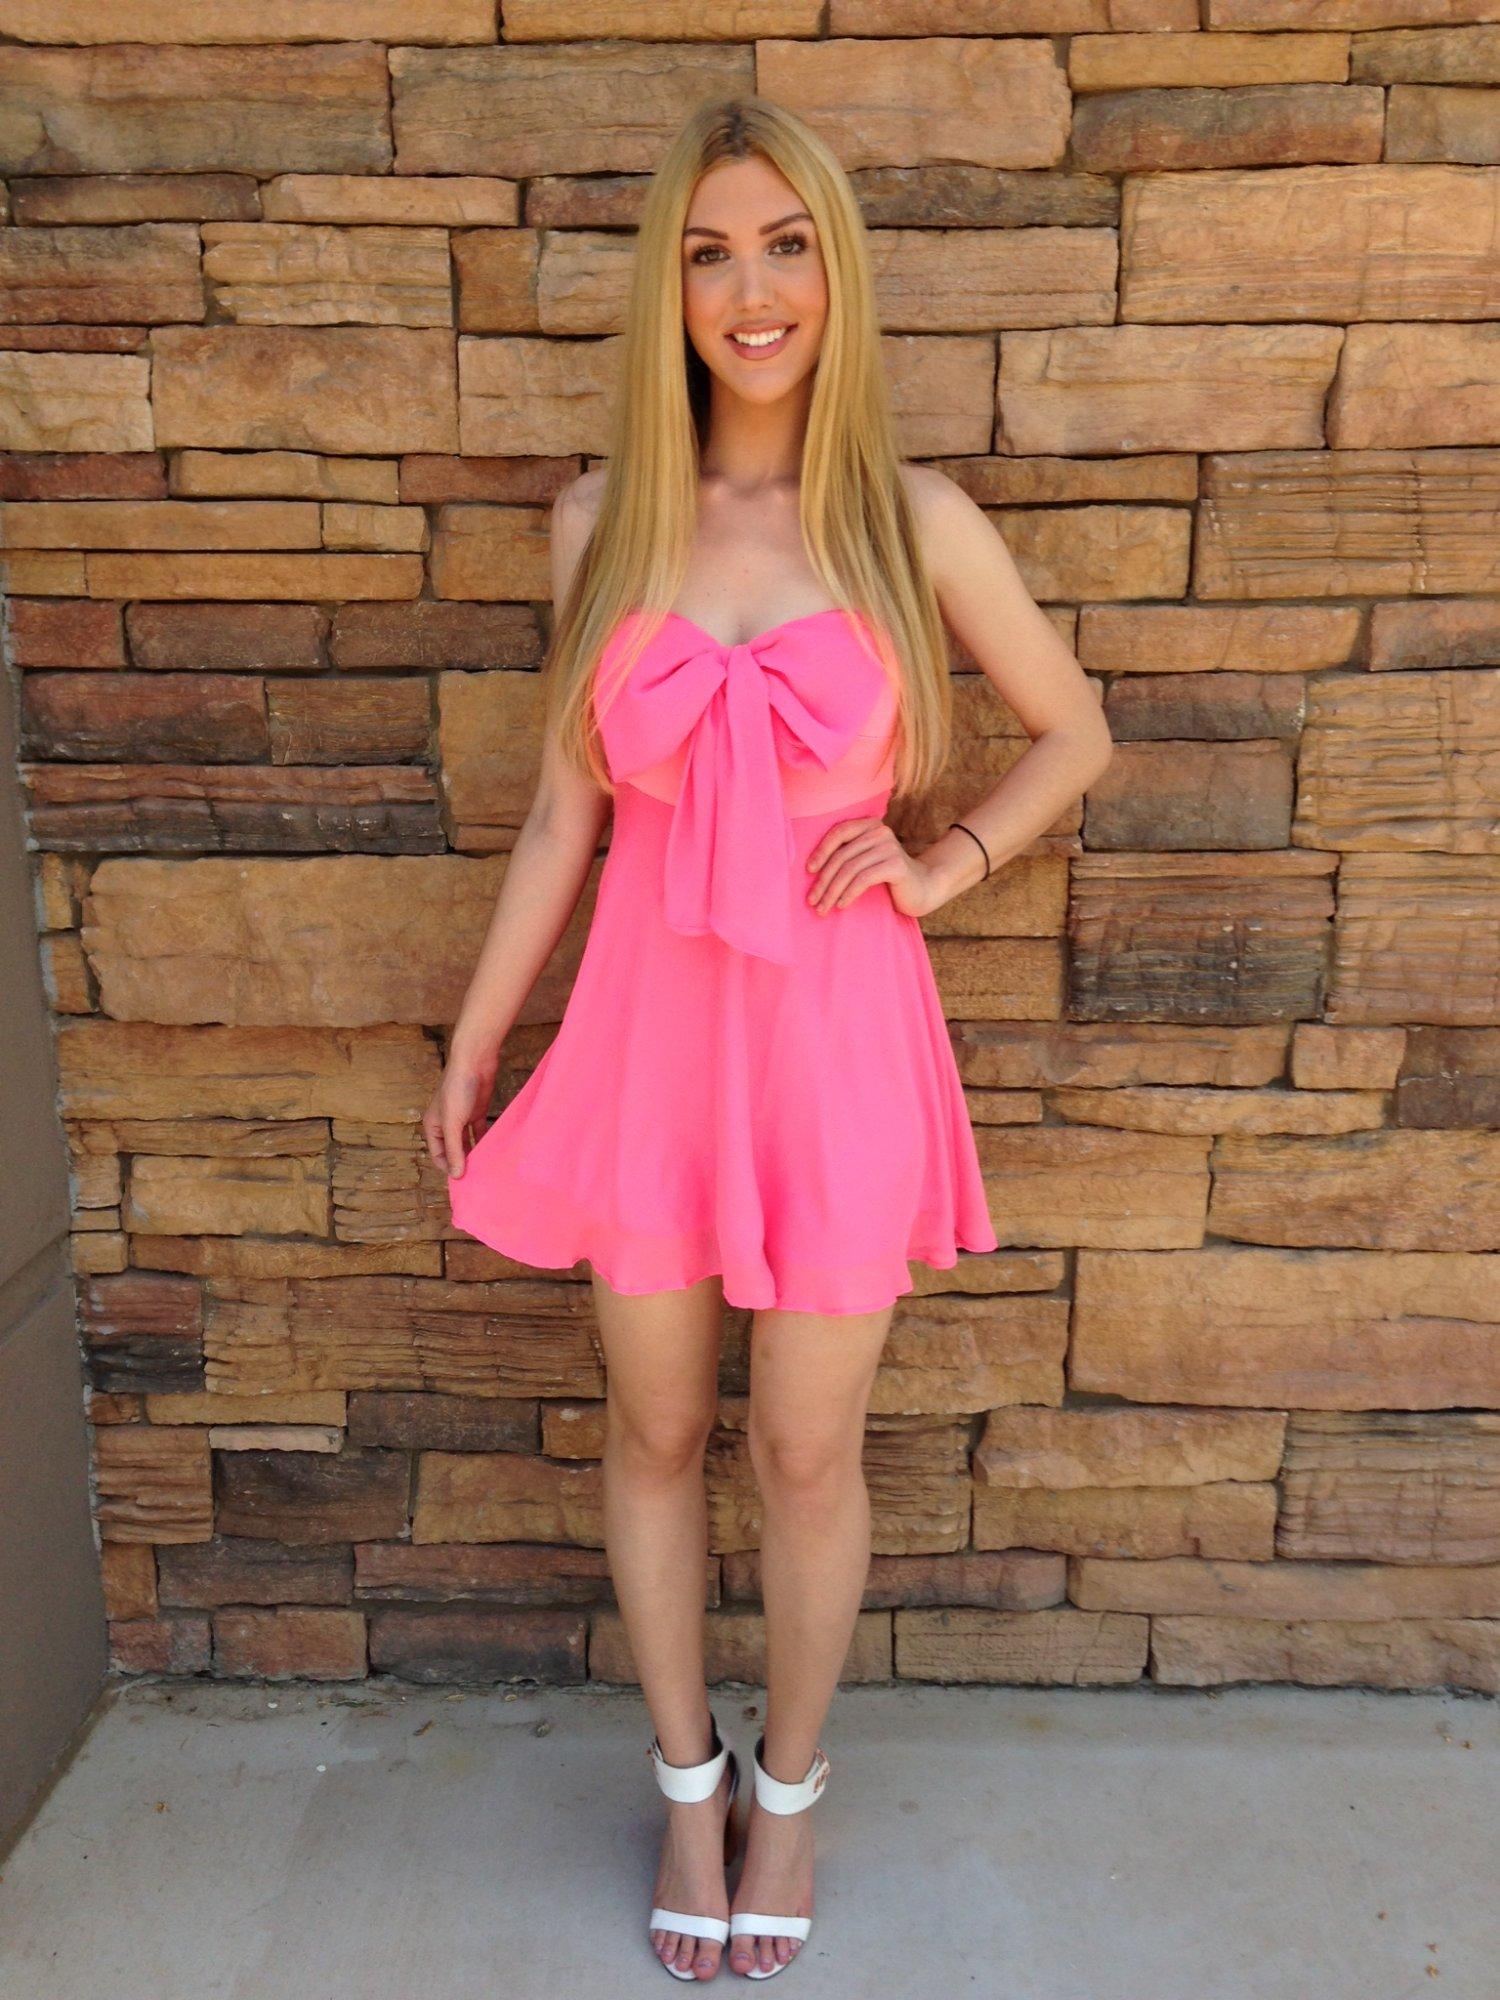 Pink Day Dress - Pink Bow Sweetheart Neckline Dress | UsTrendy